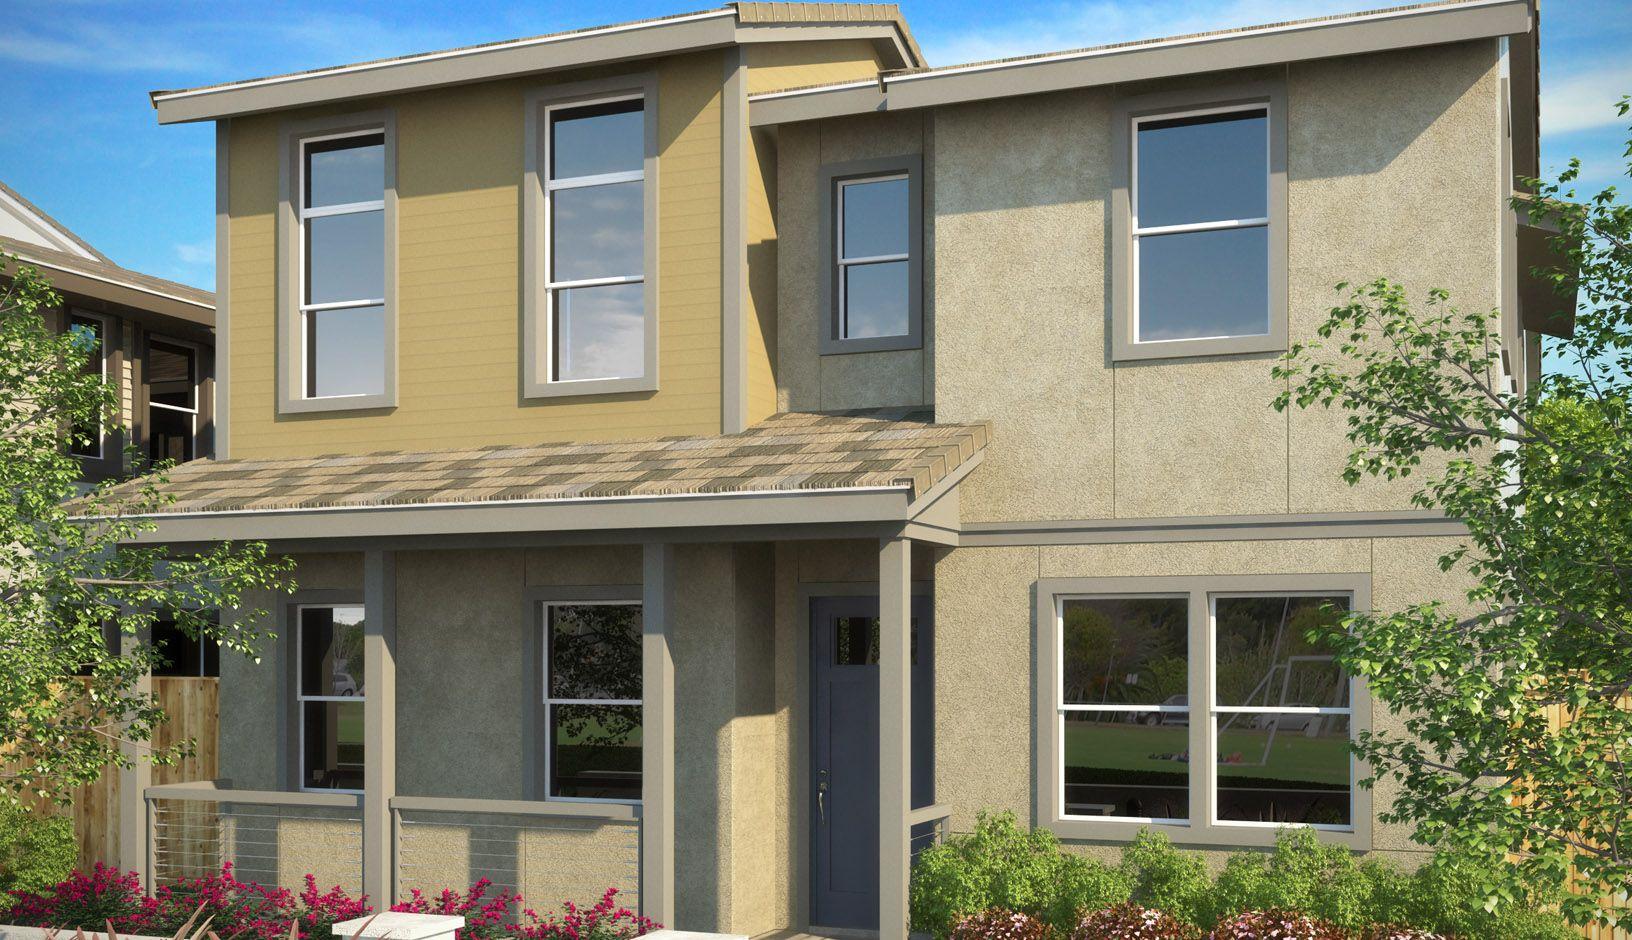 Single Family for Sale at Cadence At Alameda Landing - Residence 4 421 Singleton Avenue Alameda, California 94501 United States